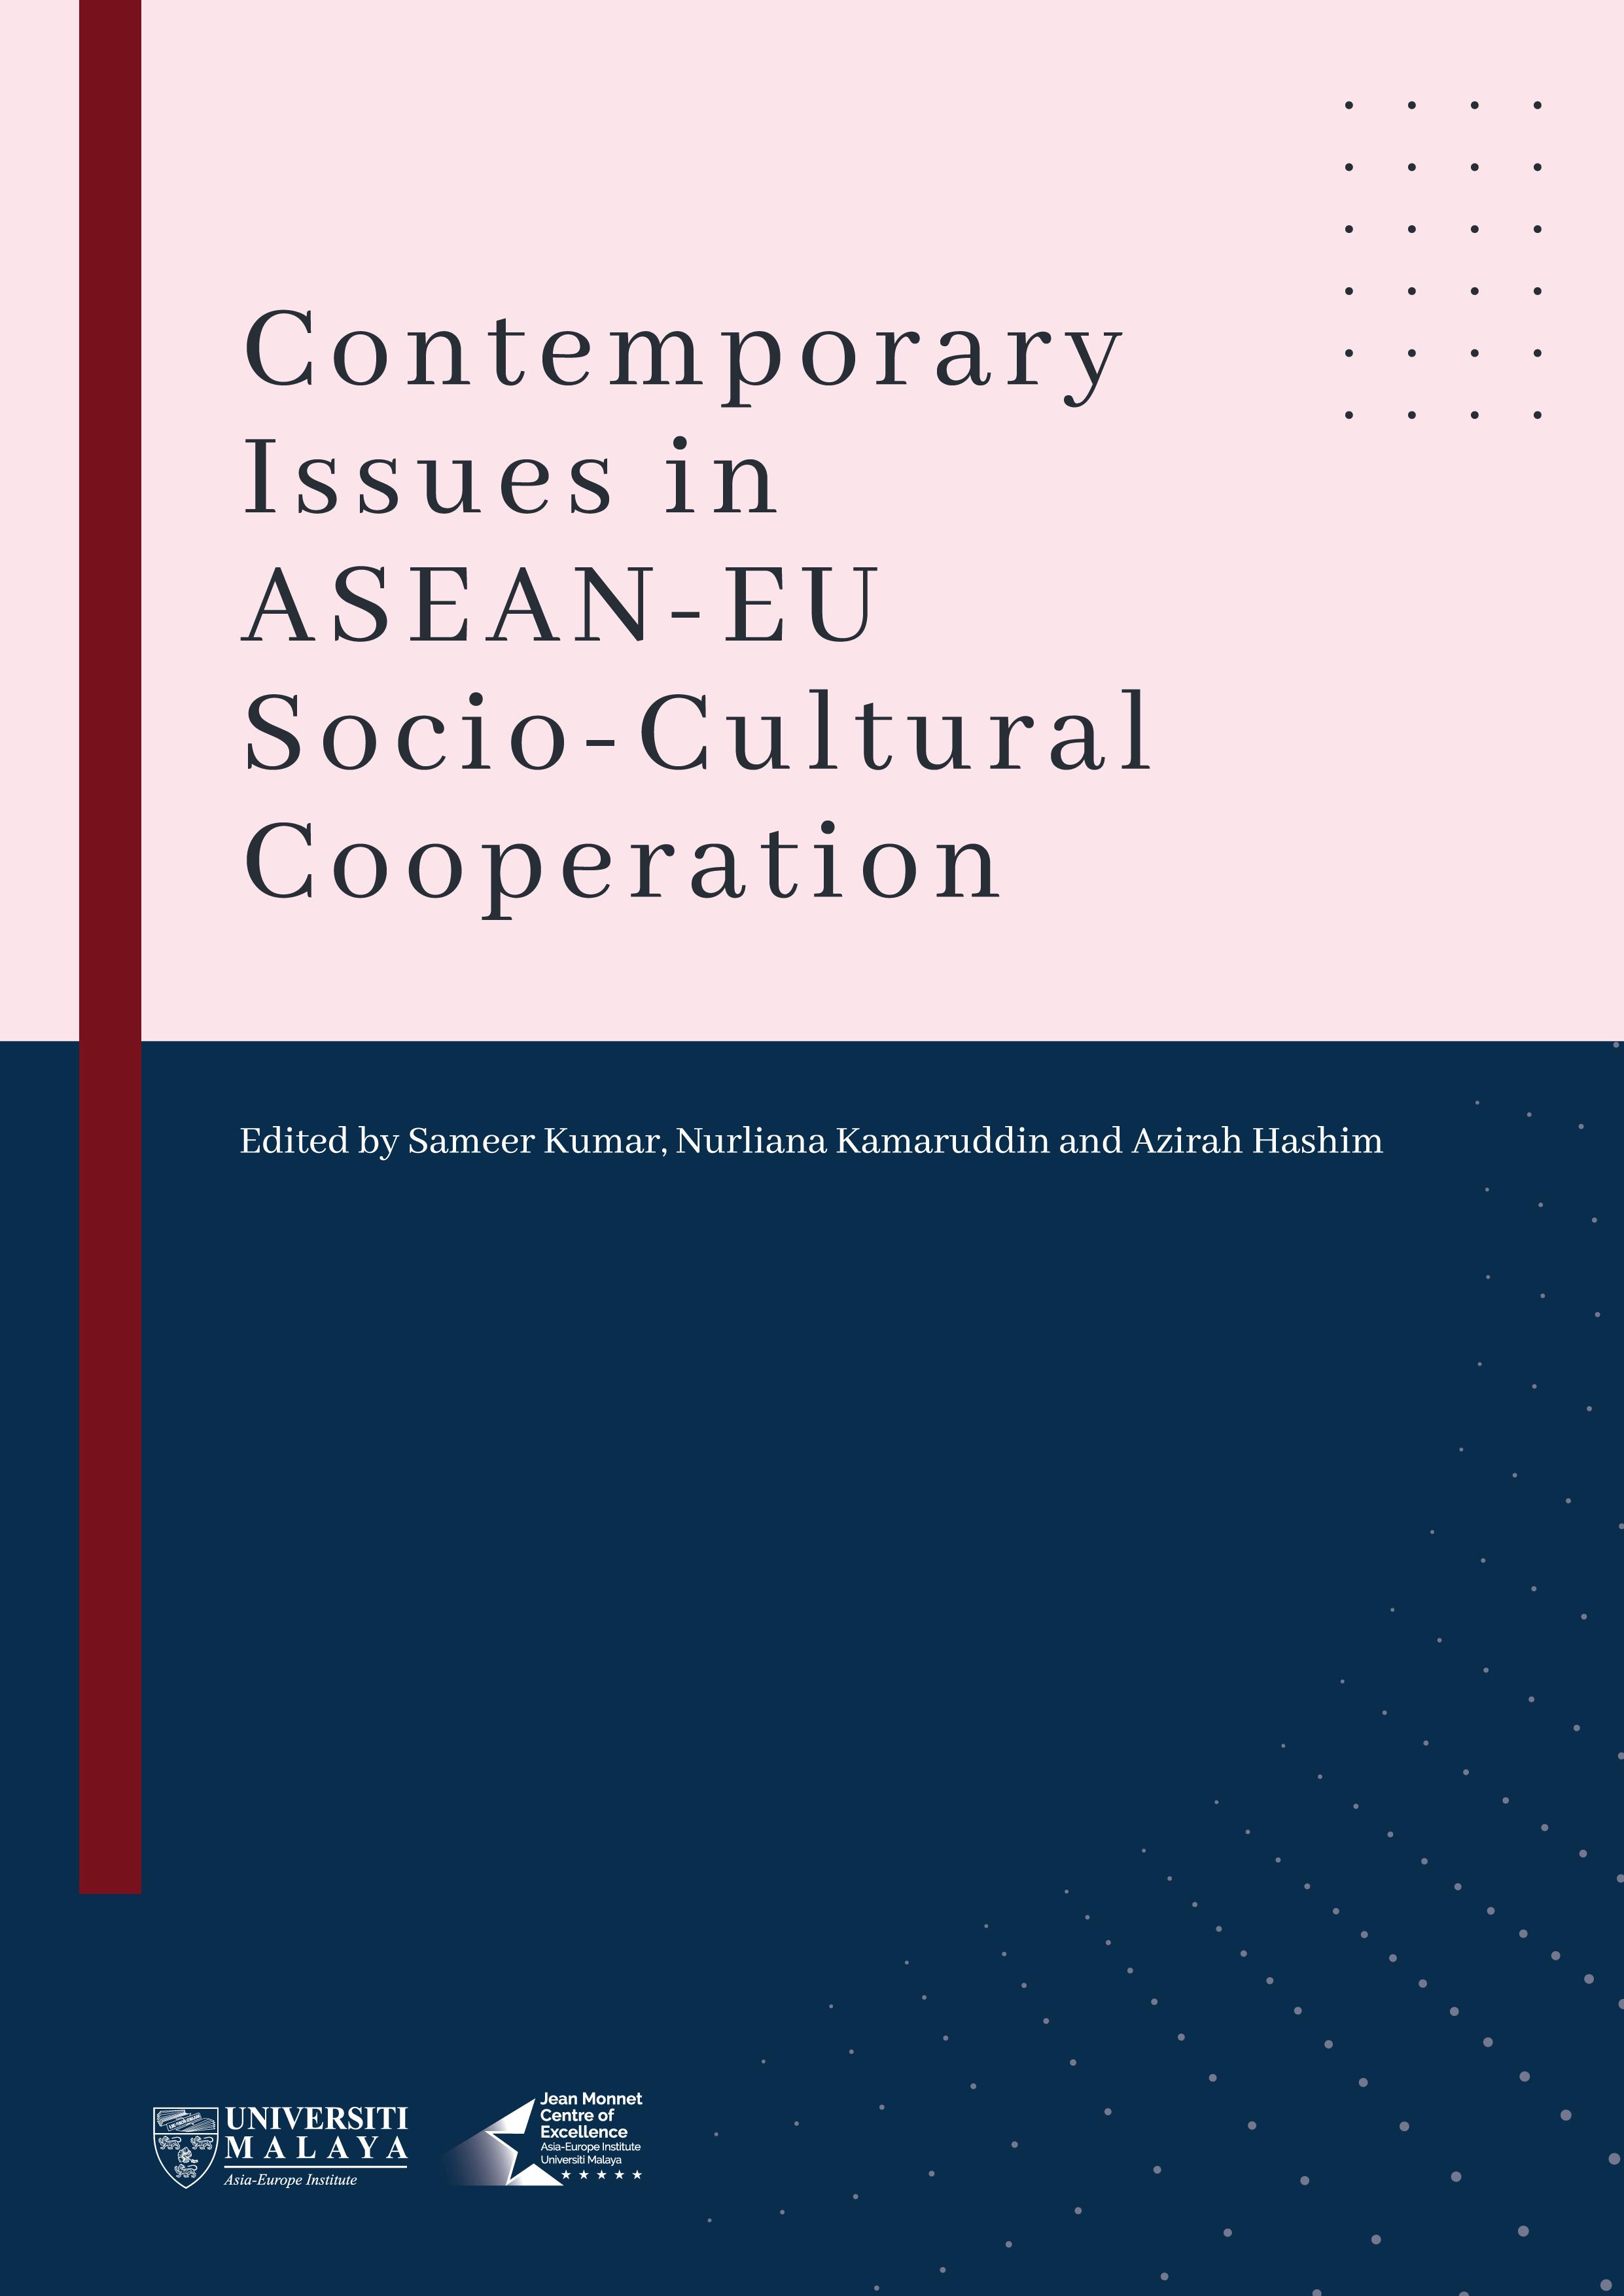 Contemporary Issues in ASEAN-EU Socio-Cultural Cooperation